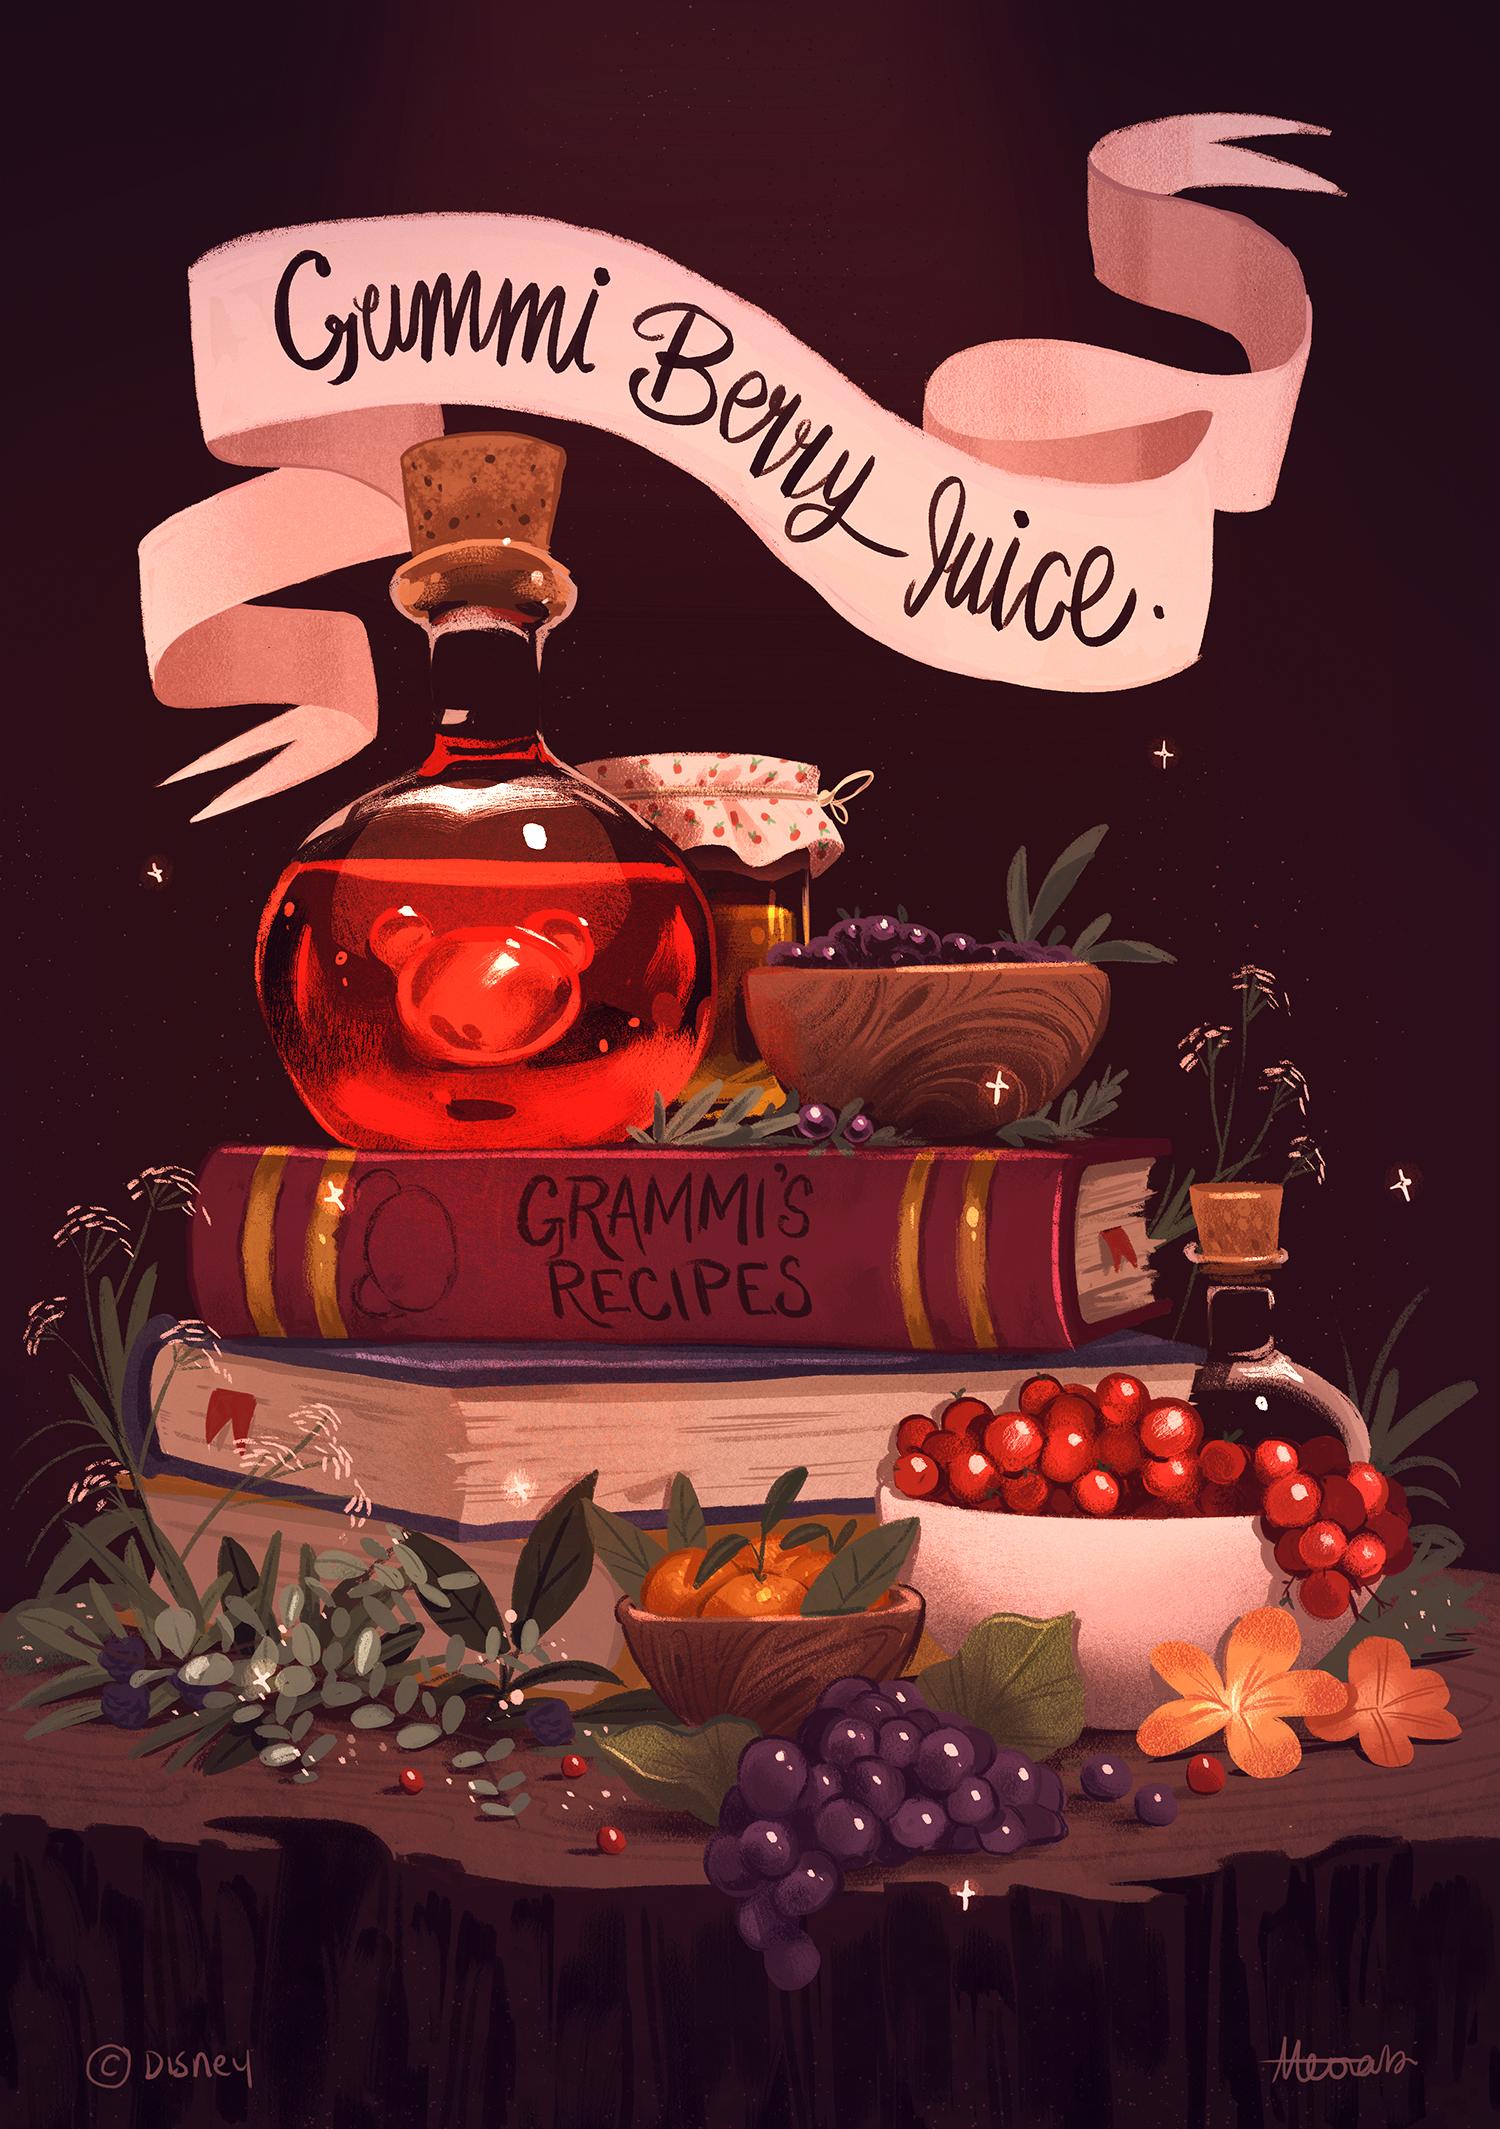 Gummi Berry Juice